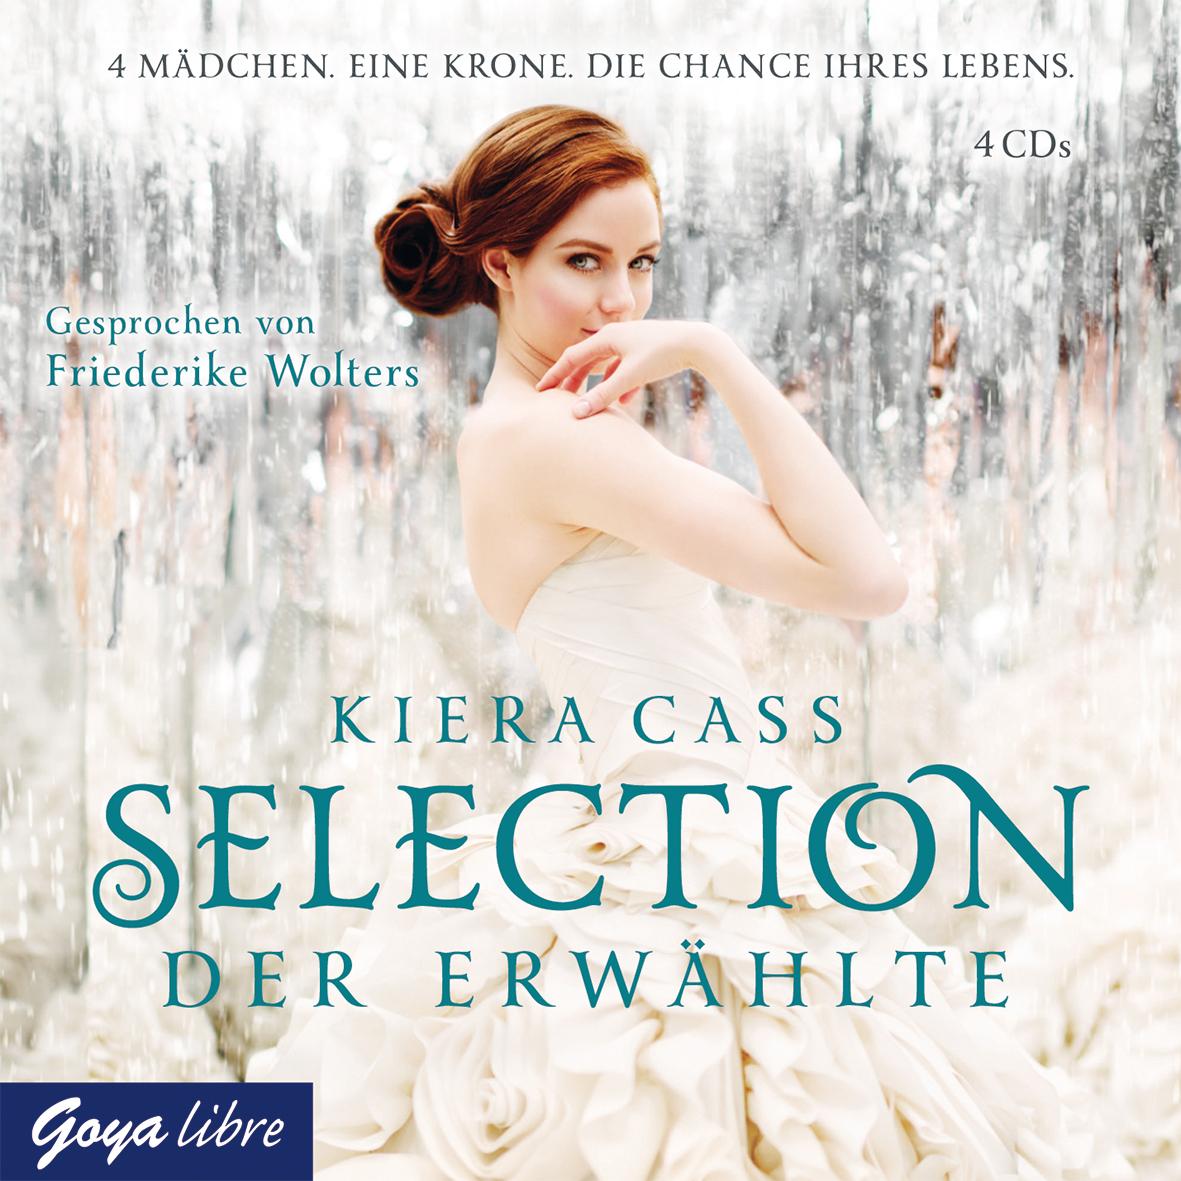 Selection: Der Erwählte - Kiera Cass [4 Audio CDs]